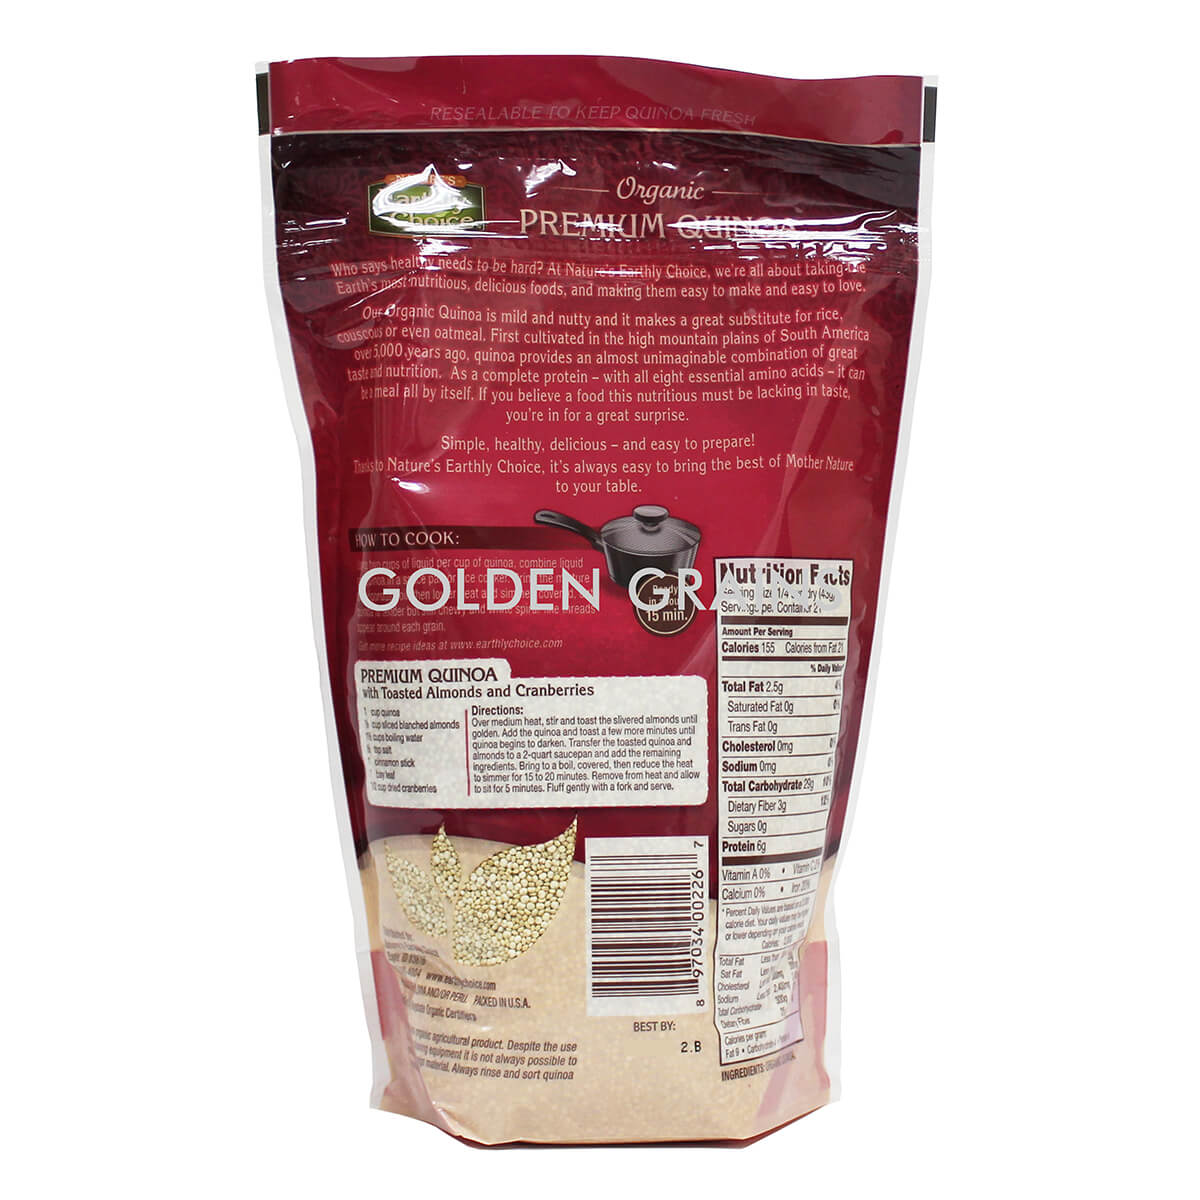 Earthly Choice Quinoa Back